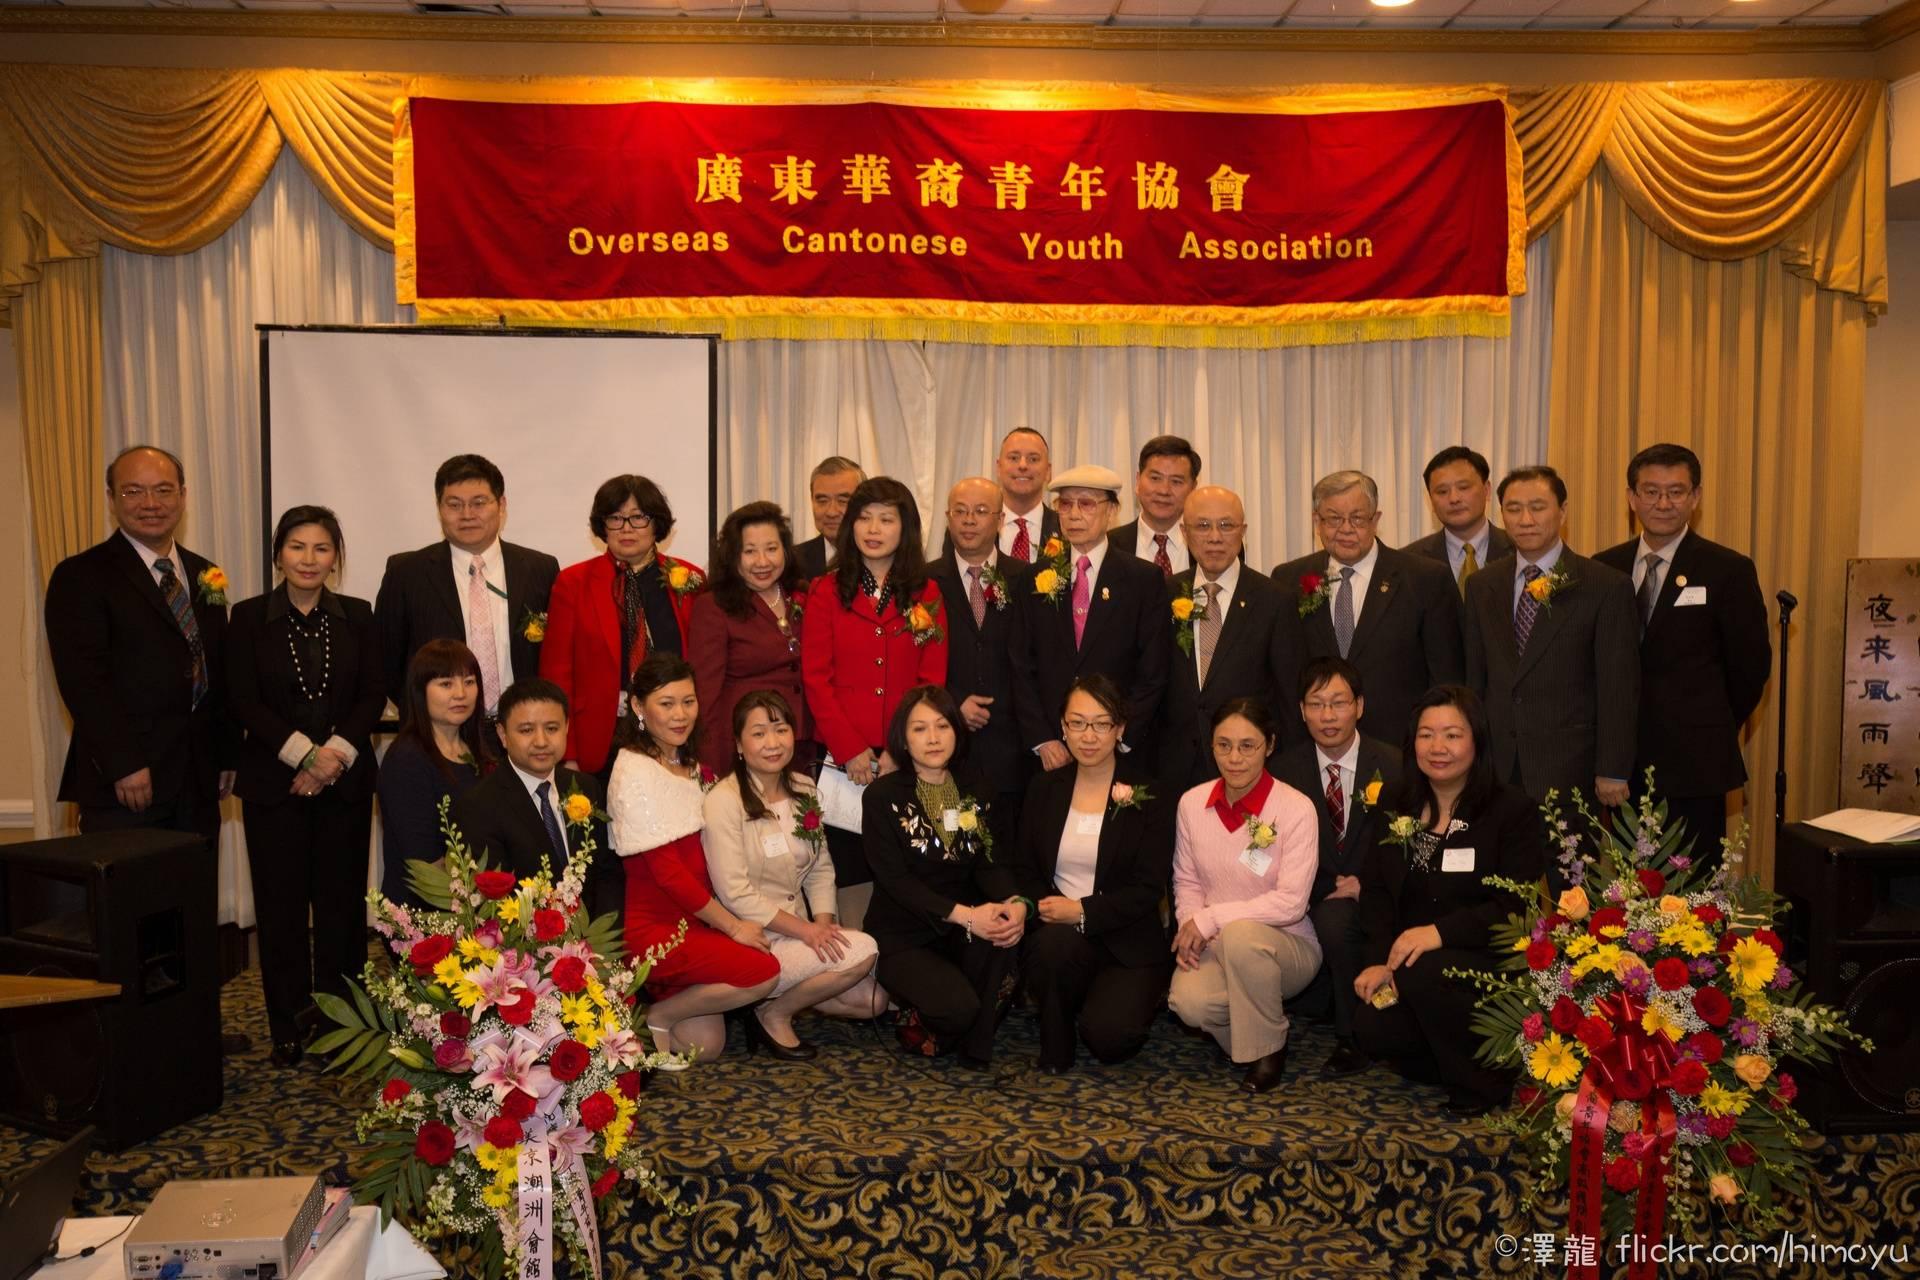 March 20, 2015 Inaugural Celebration